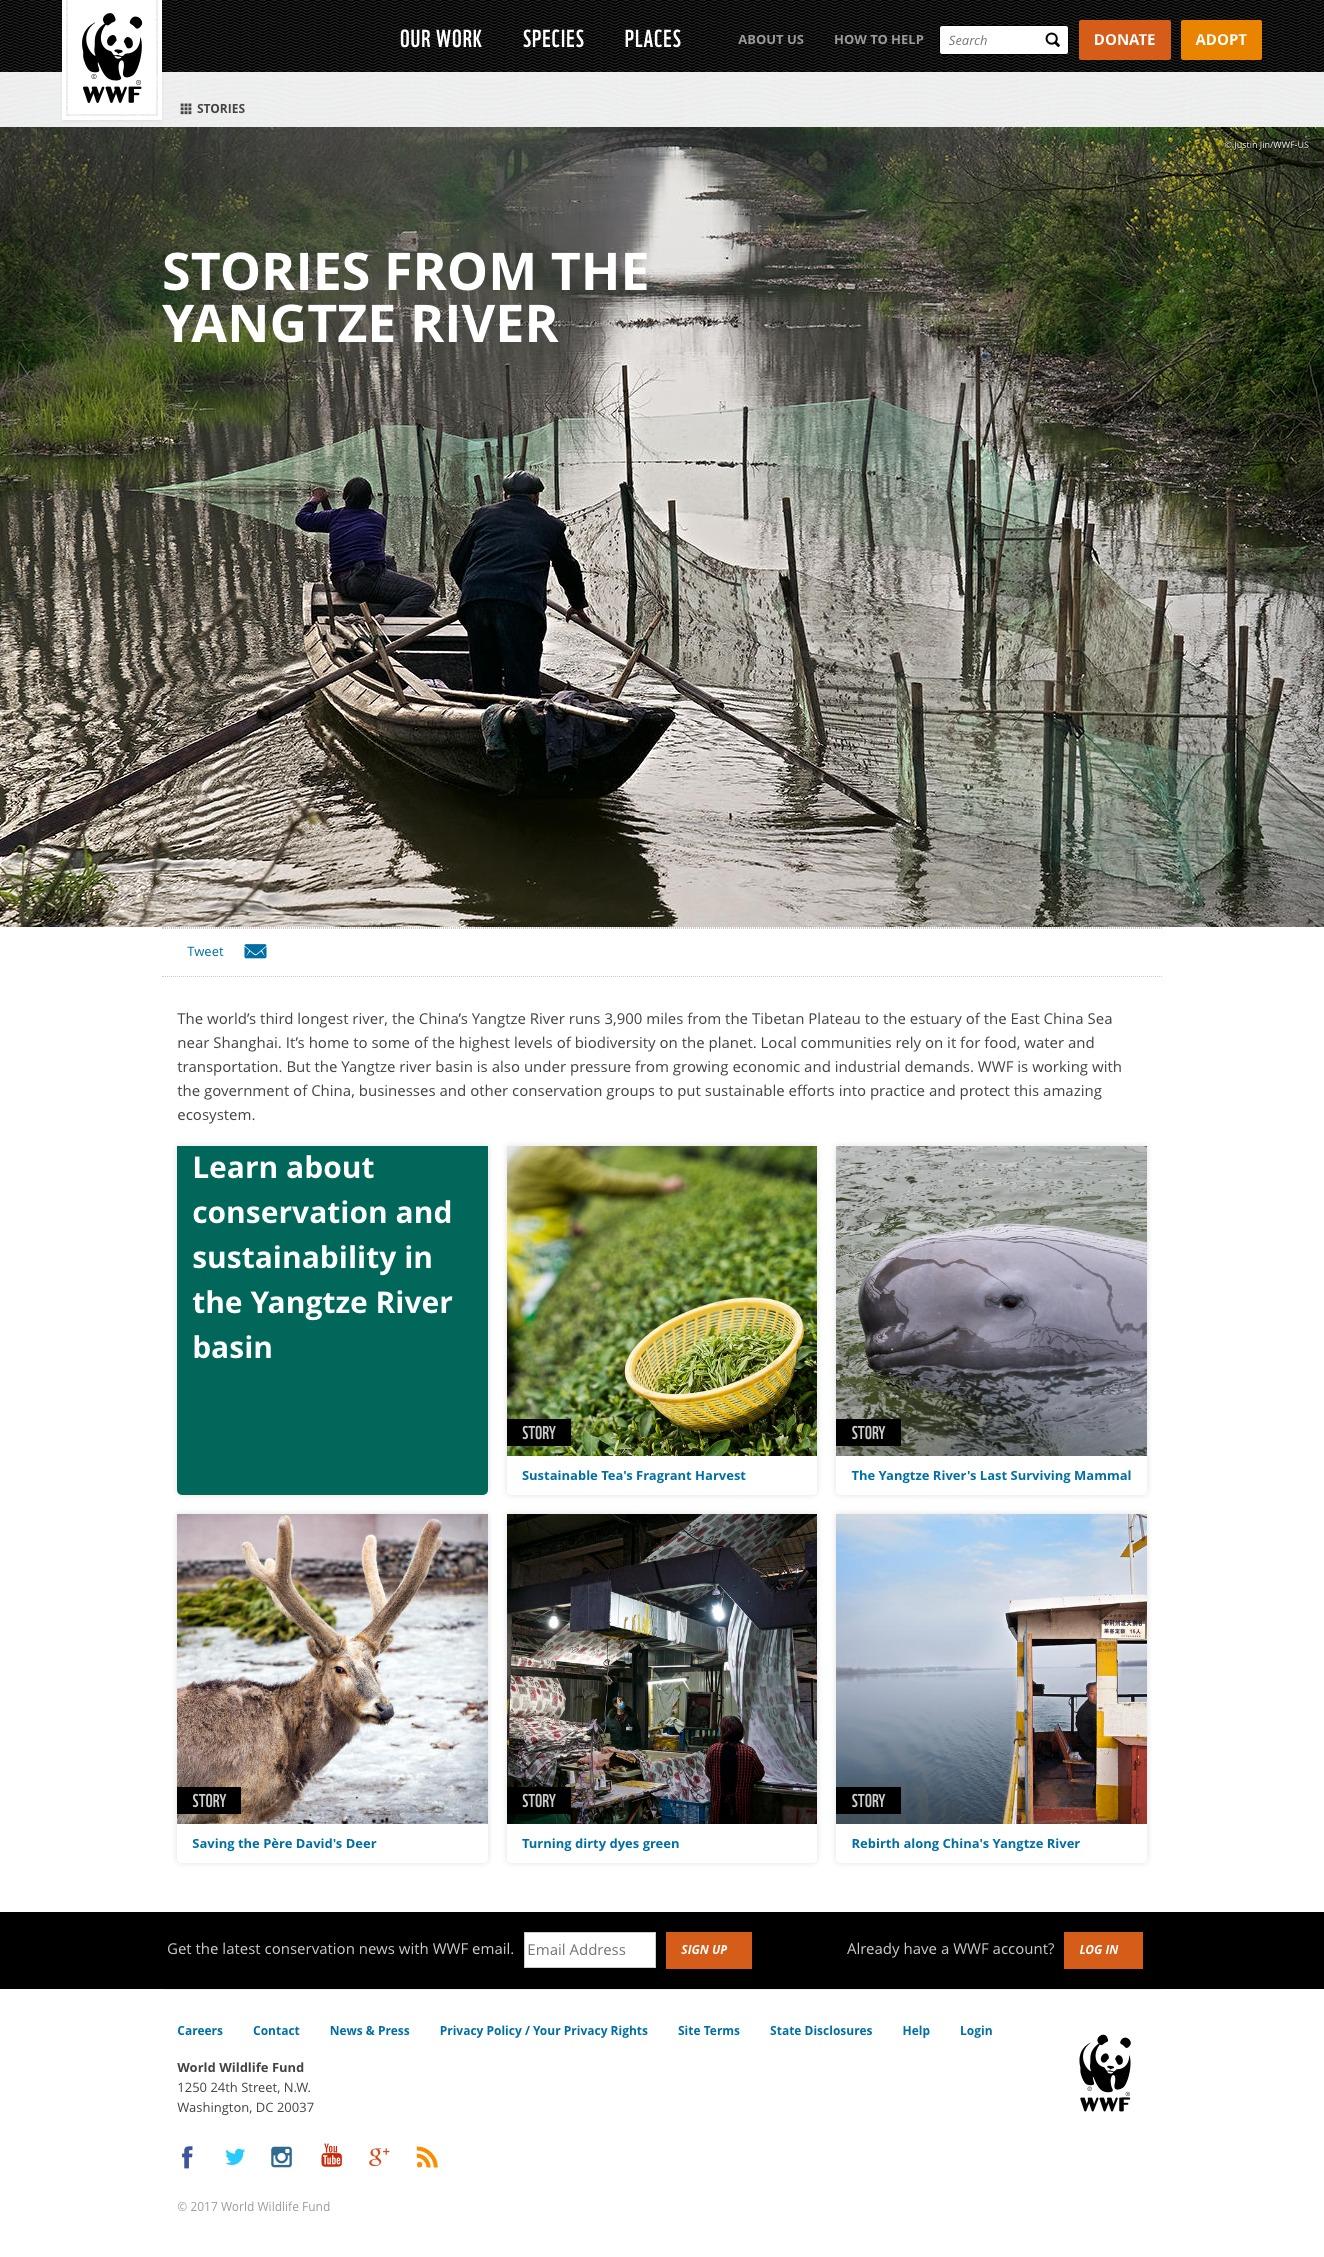 WWF – China's Yangtze River